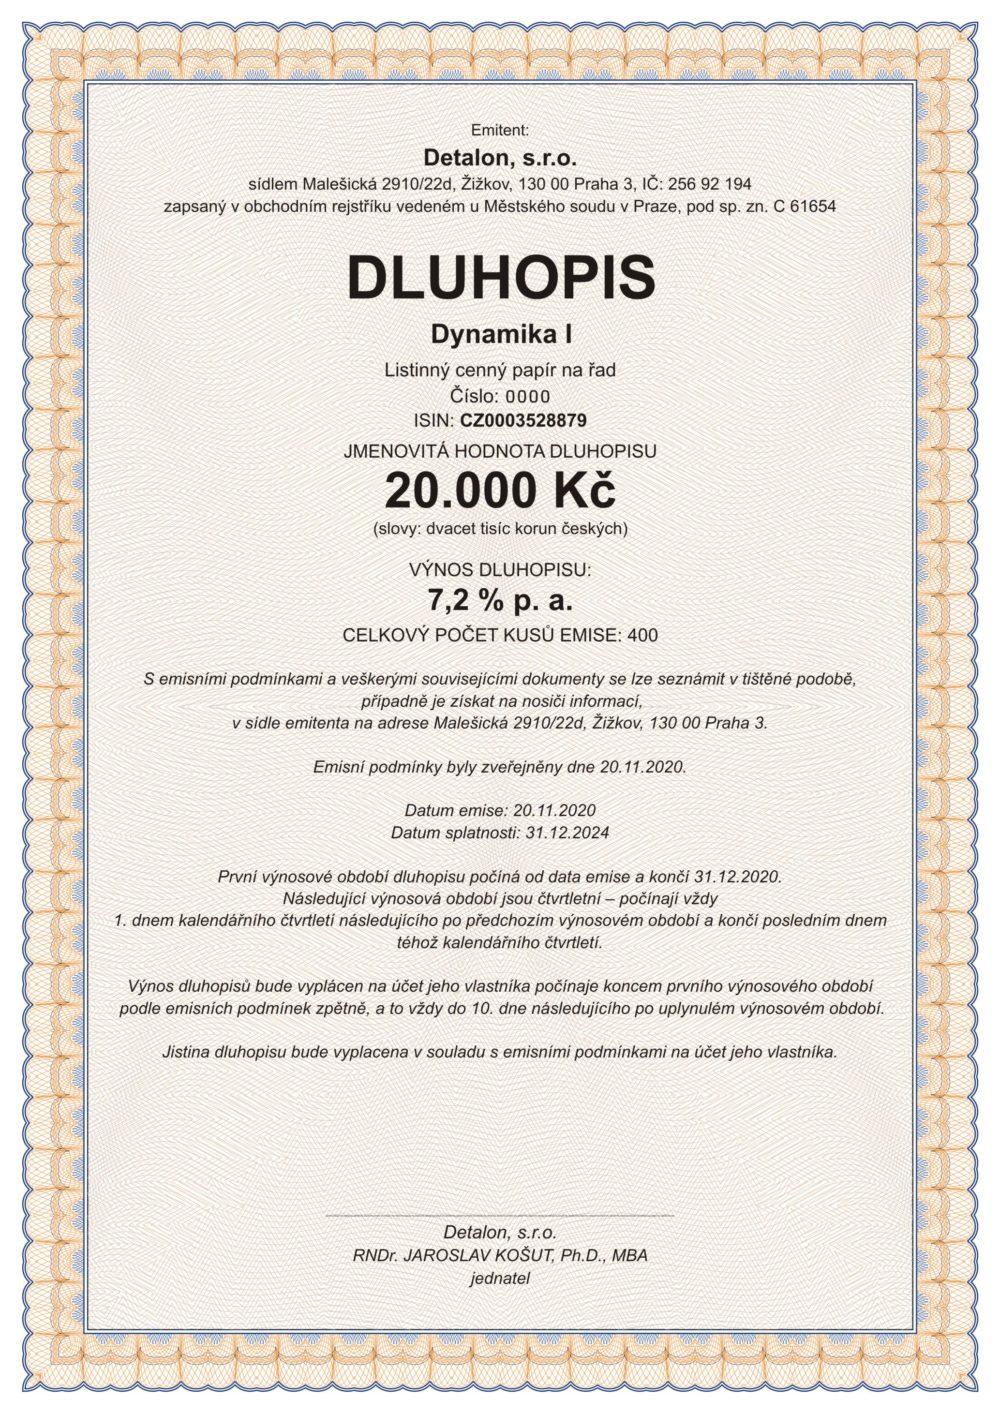 DLUHOPISY DETALON XII/2024